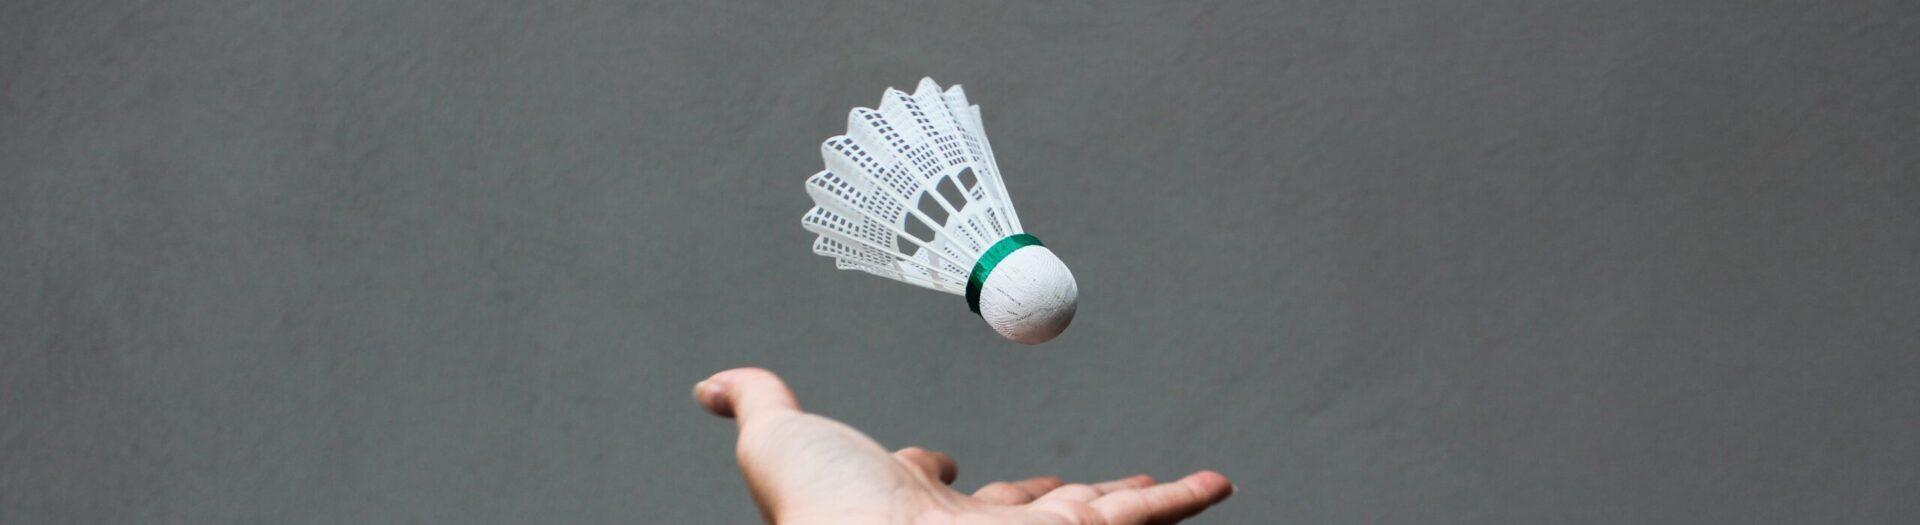 Træningslejr badminton - De perfekte rammer